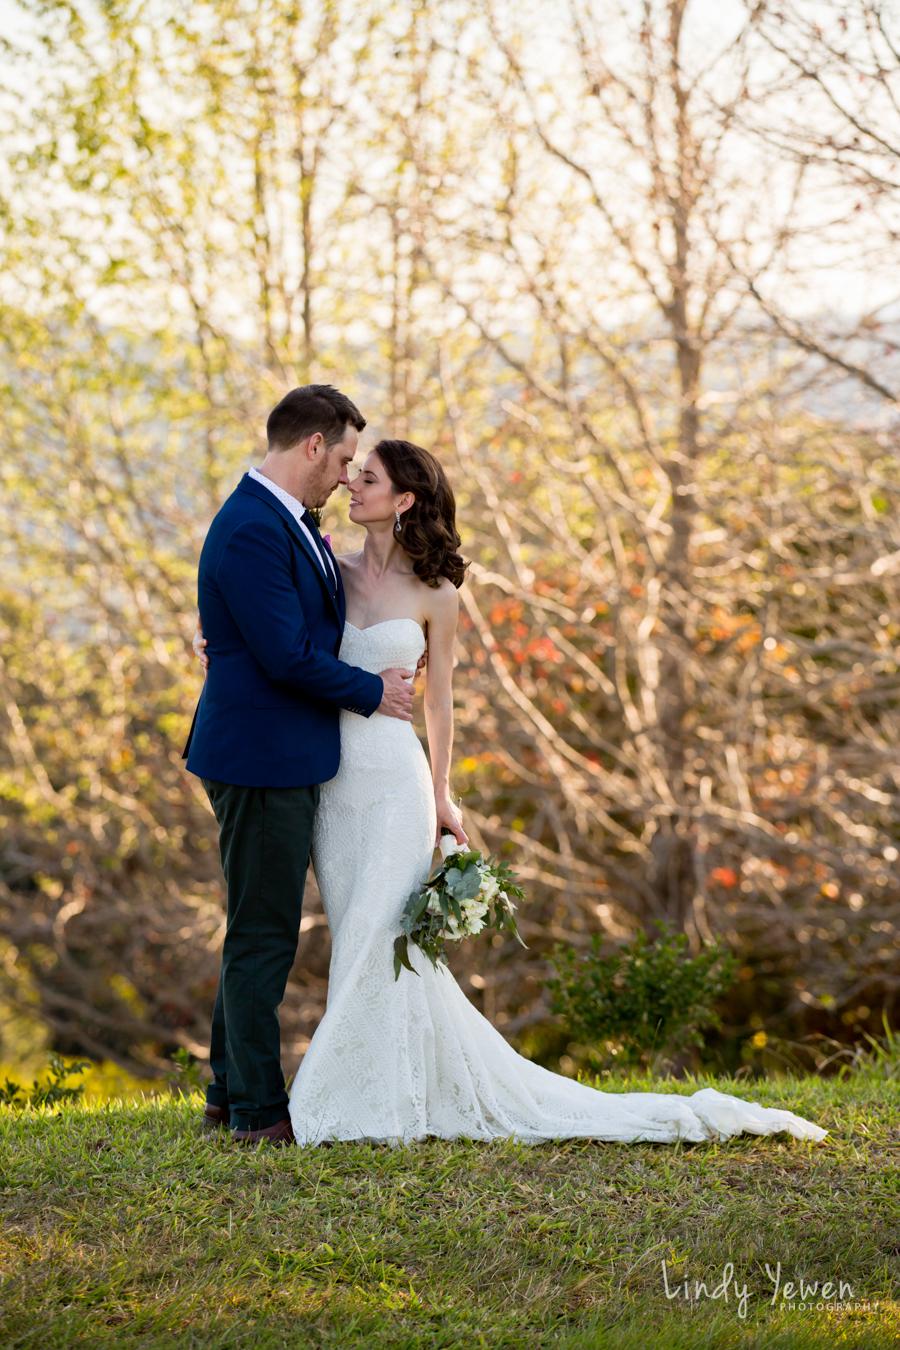 Montville-wedding-photographer-Lauren-Kirby 499.jpg